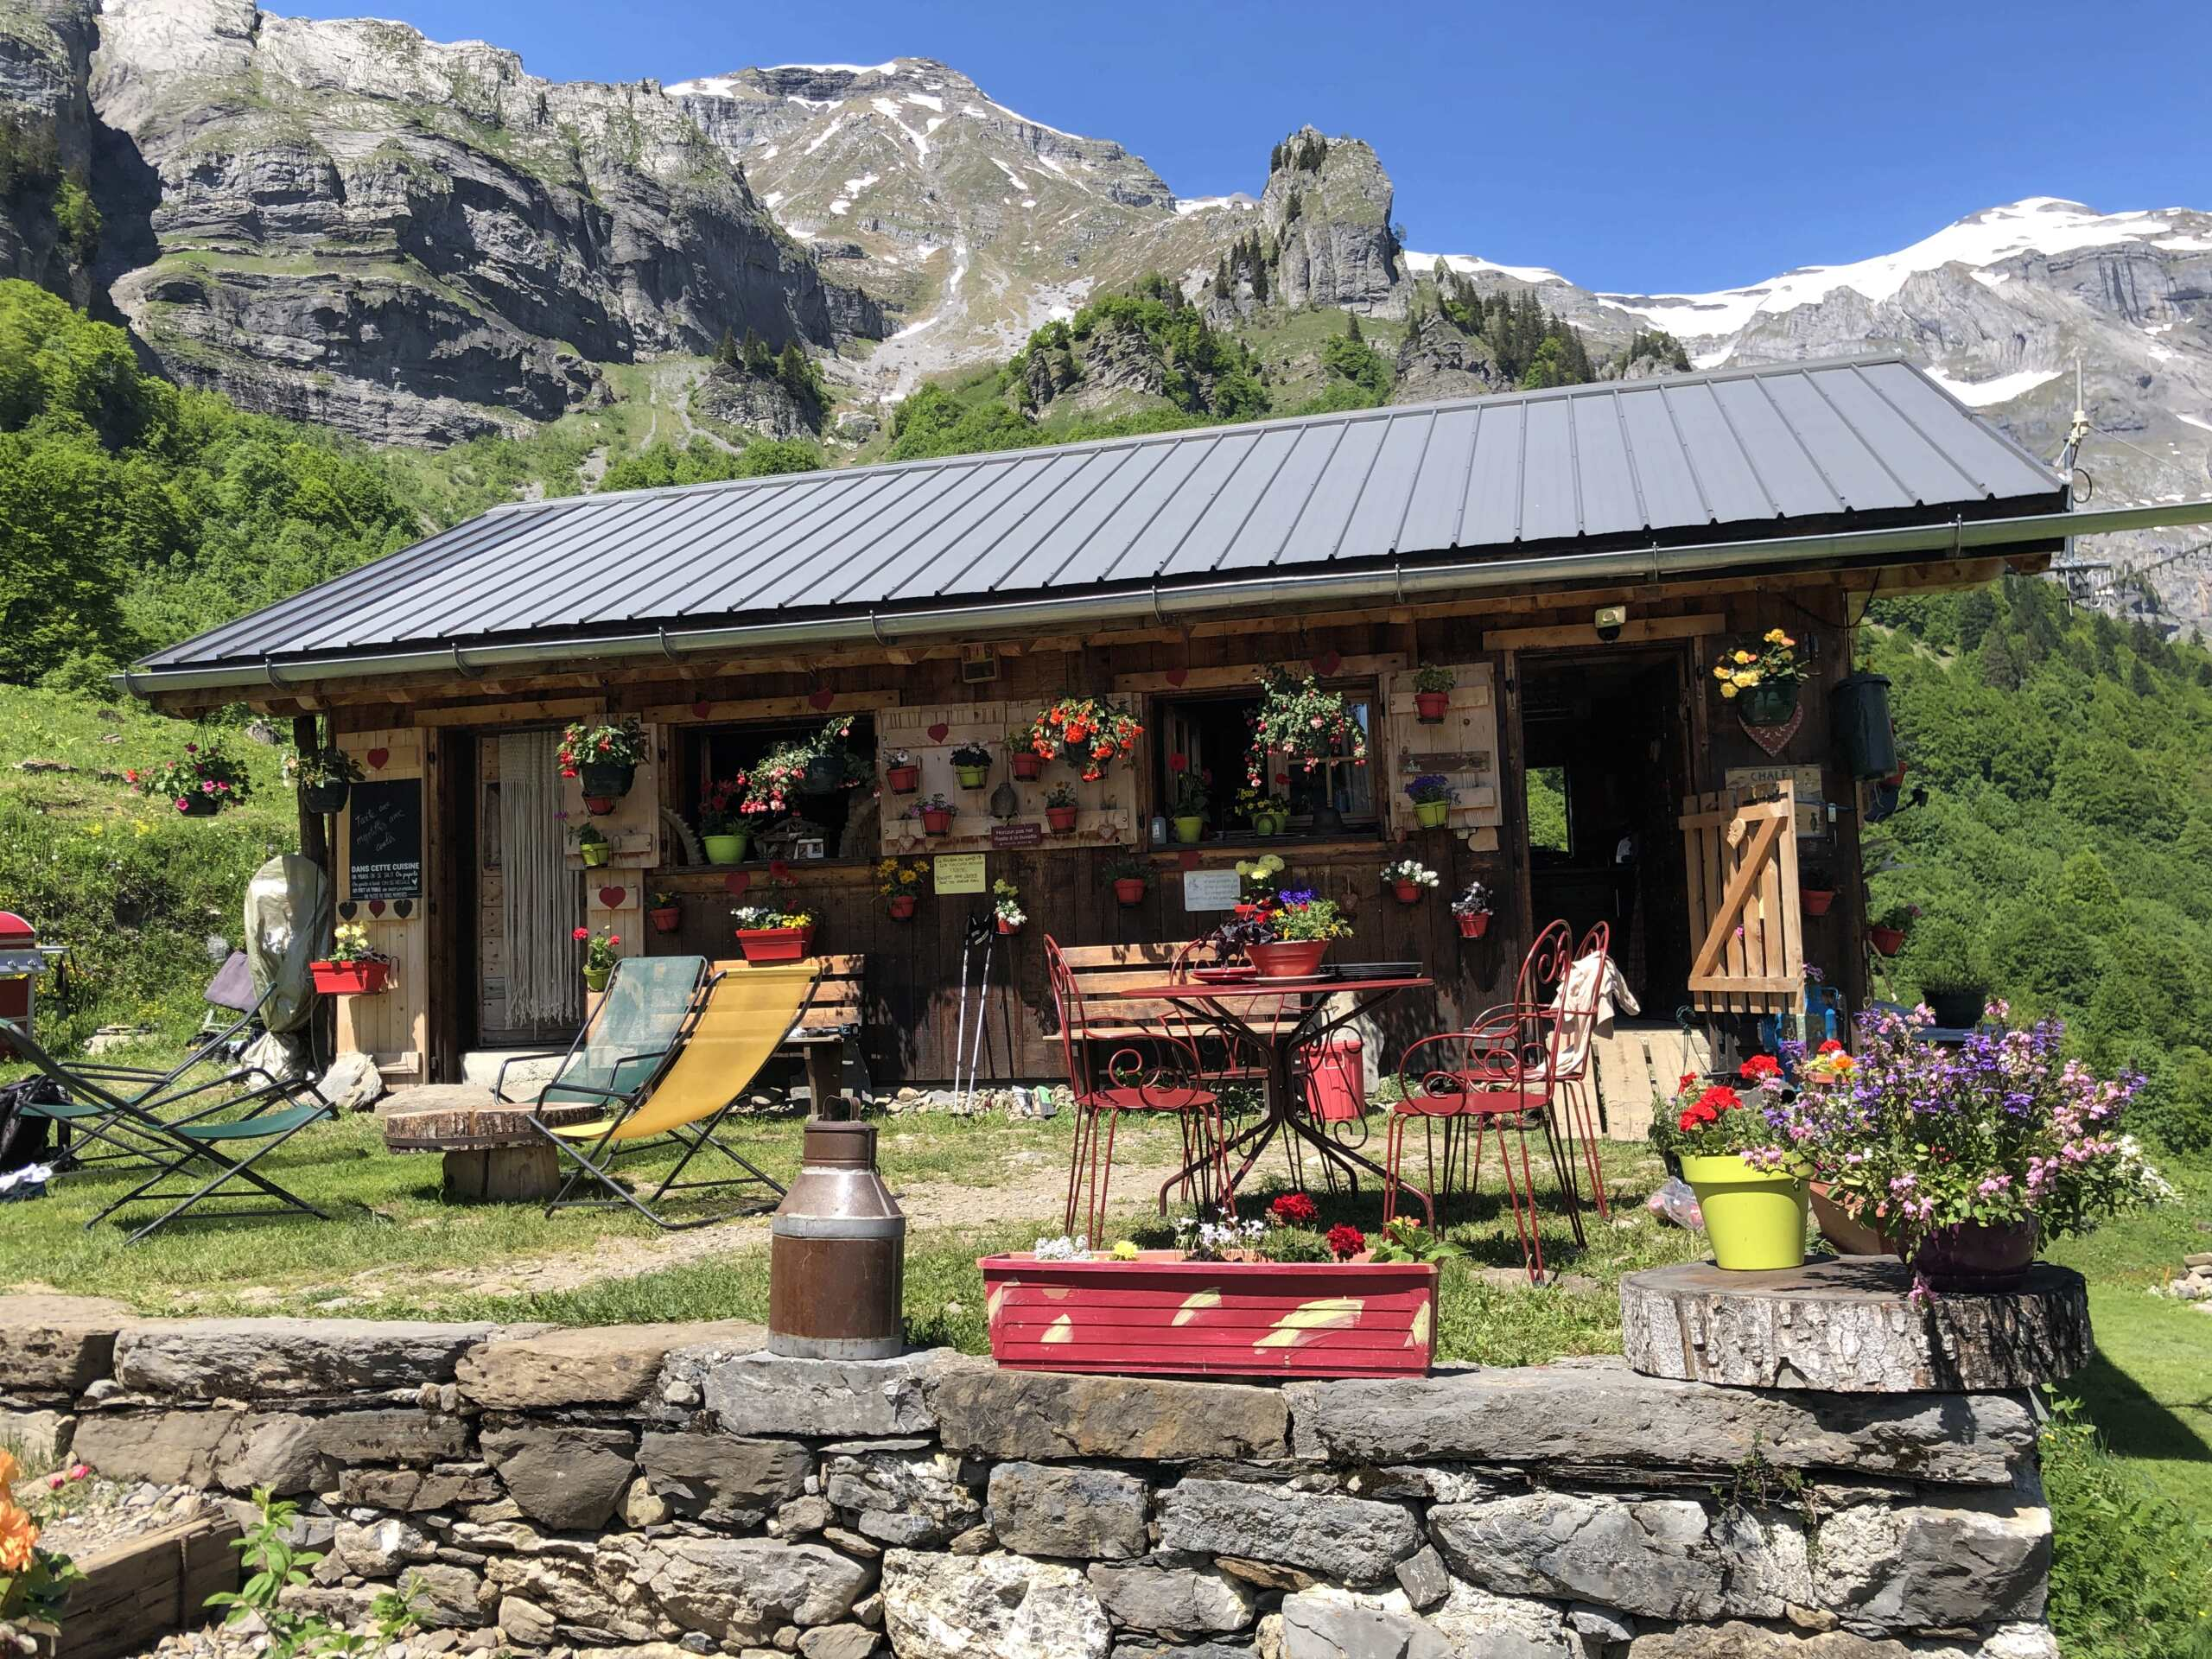 Petites balades en Rhône-Alpes - Page 3 Sixt_f19